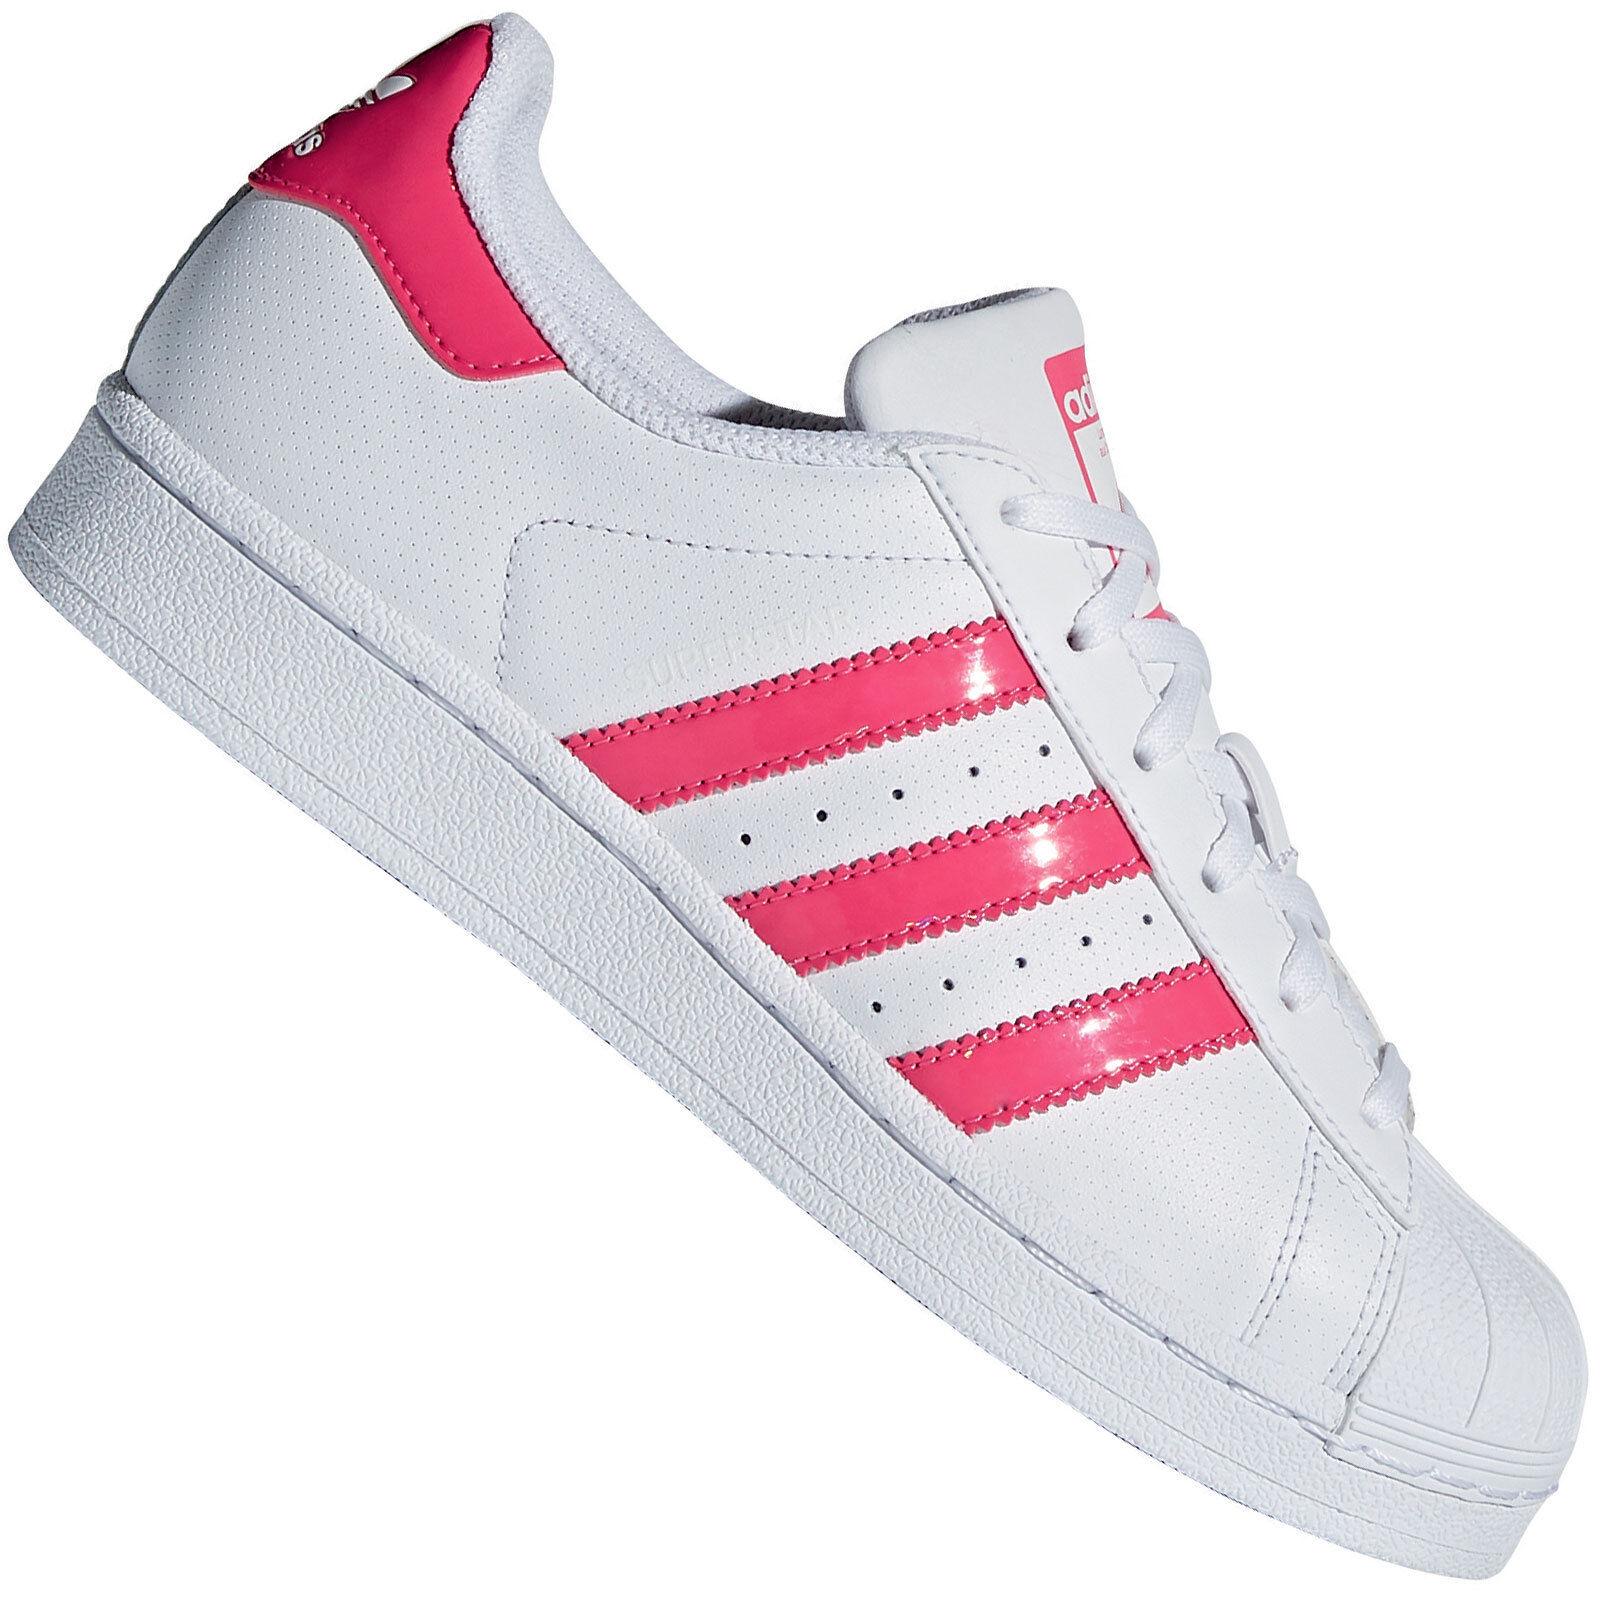 Adidas Originals Superstar J Damen-Turnschuhe Turnschuhe Kinder Weiß Rosa Vintage Flut Schuhe